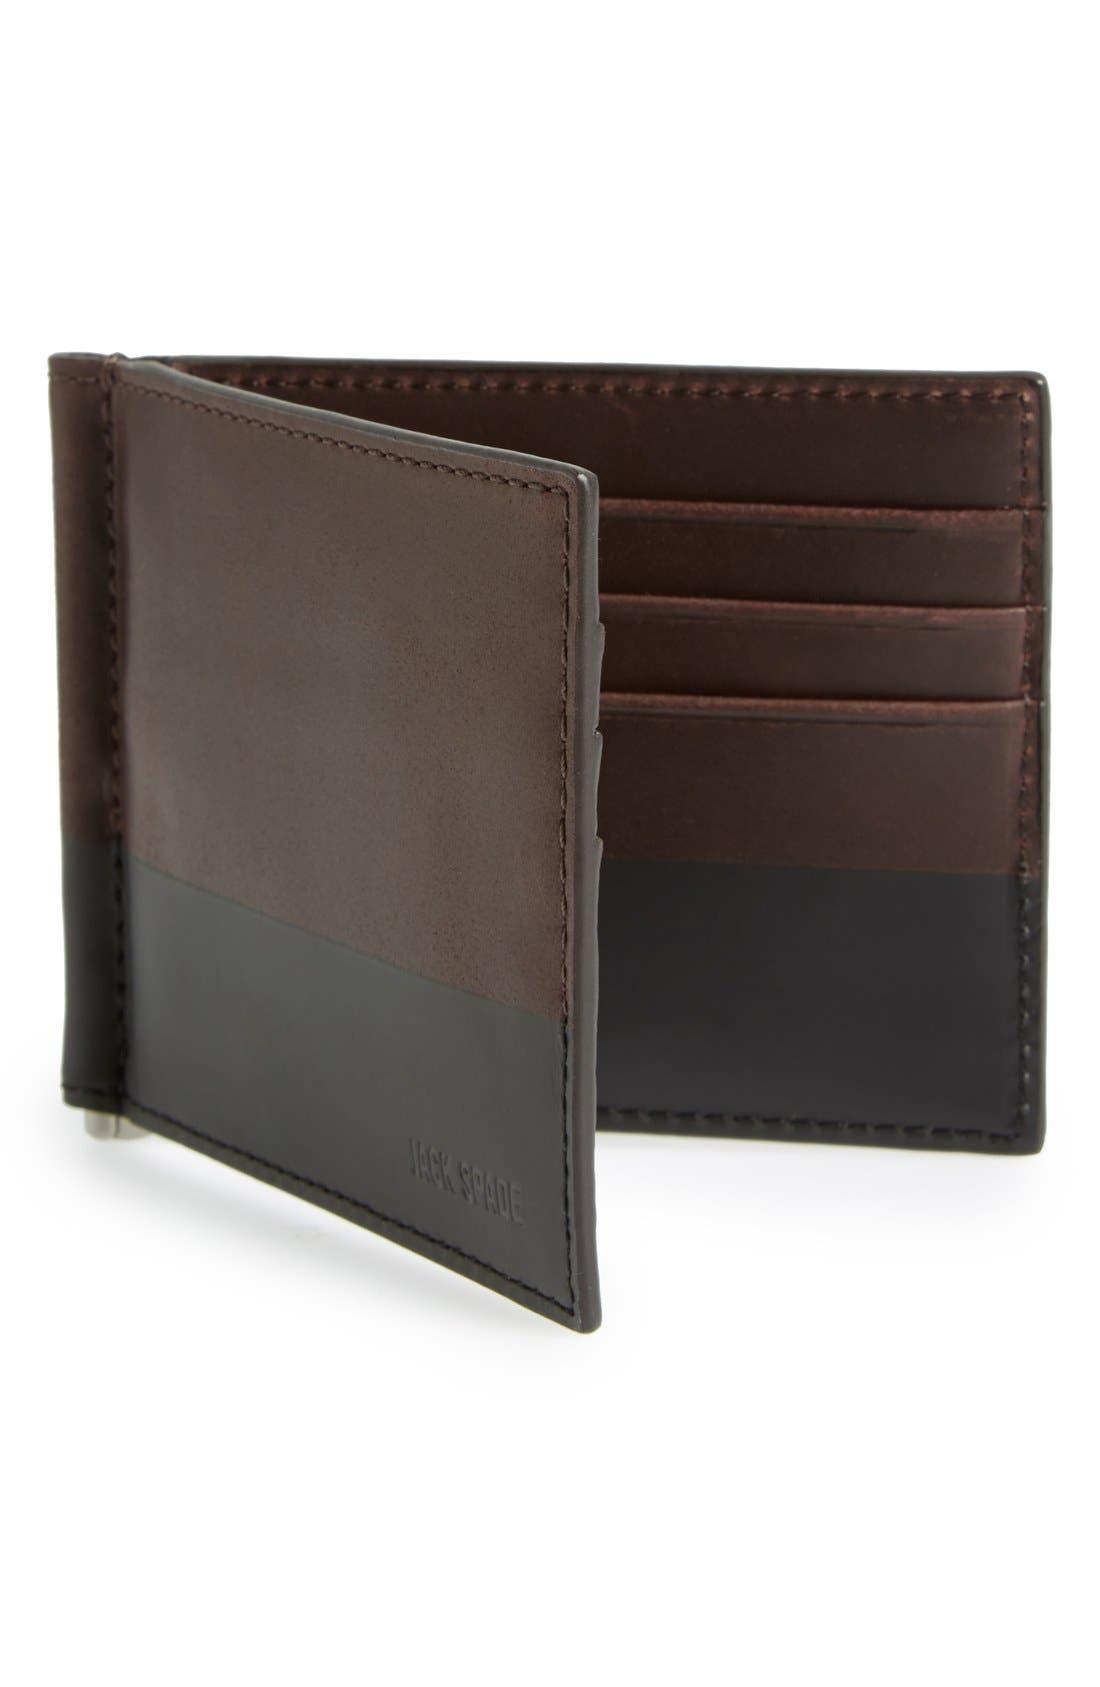 JACK SPADE,                             Leather Money Clip Wallet,                             Alternate thumbnail 2, color,                             203